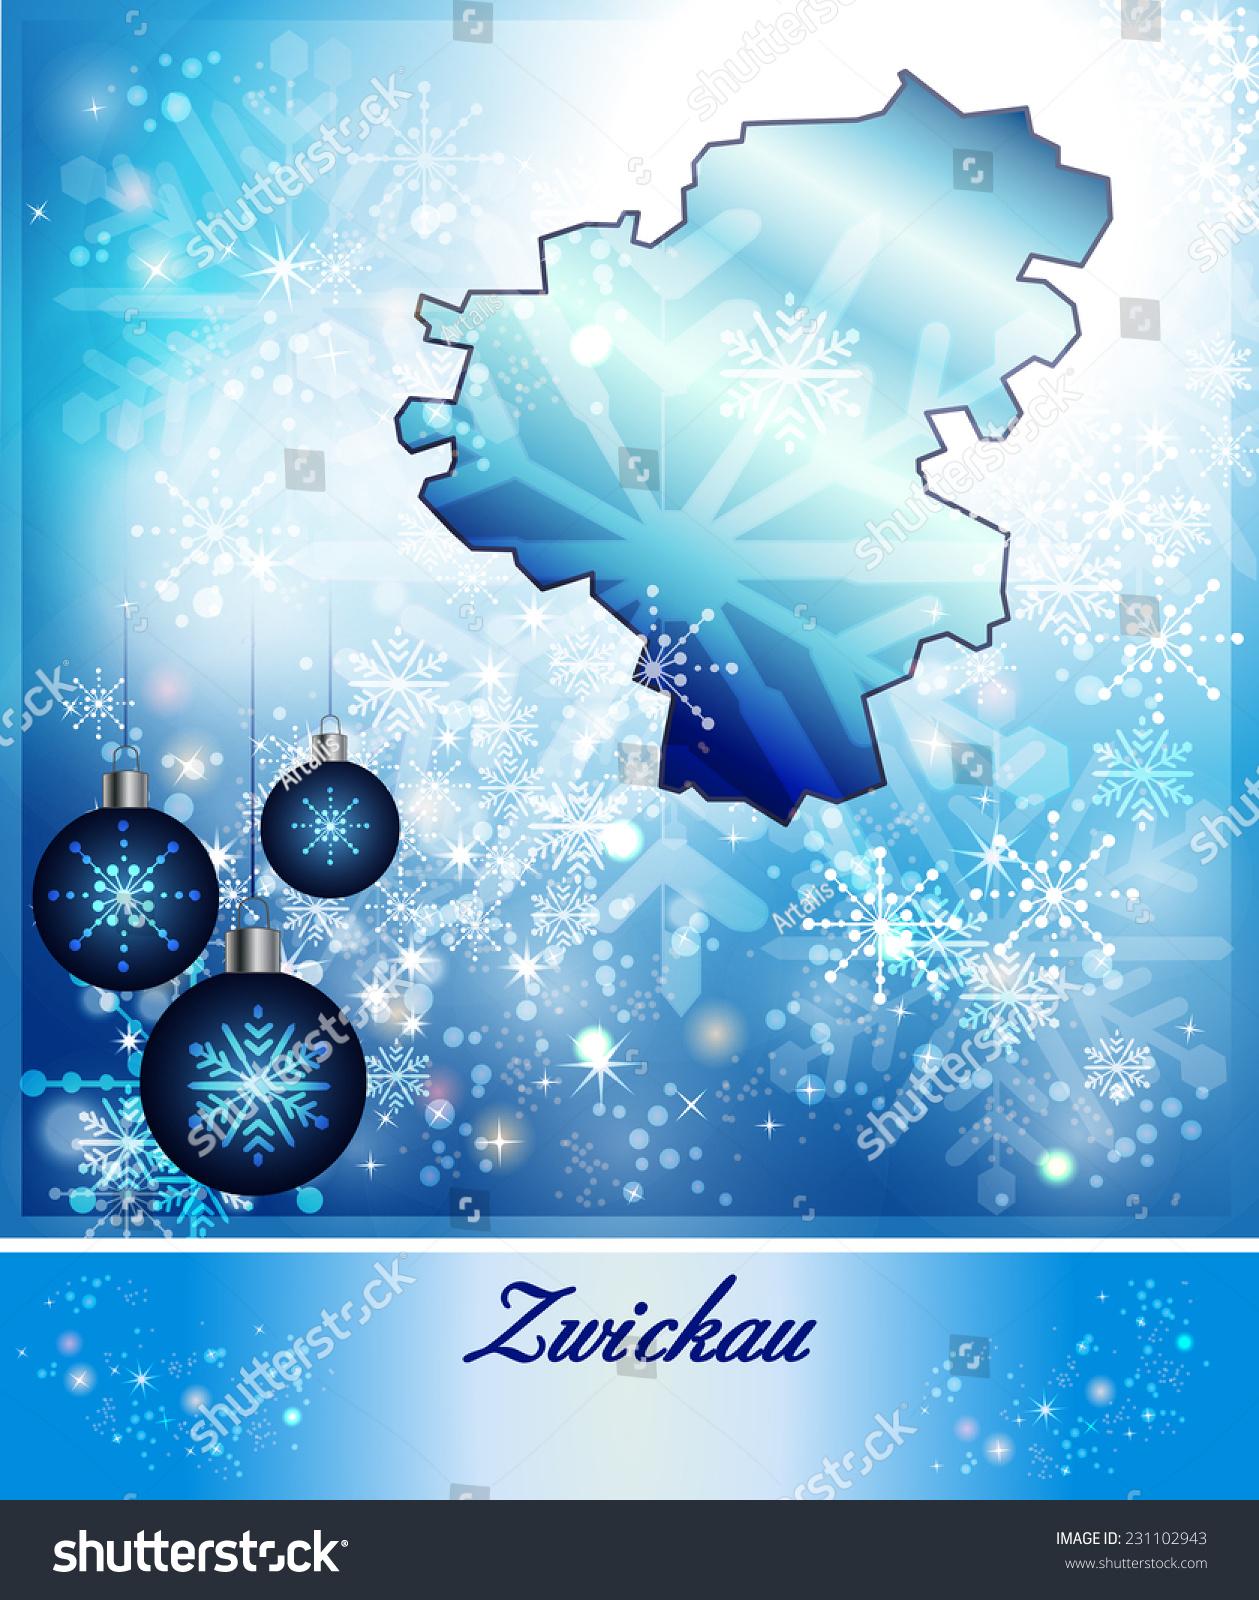 Map Zwickau Christmas Design Blue Stock Illustration 231102943